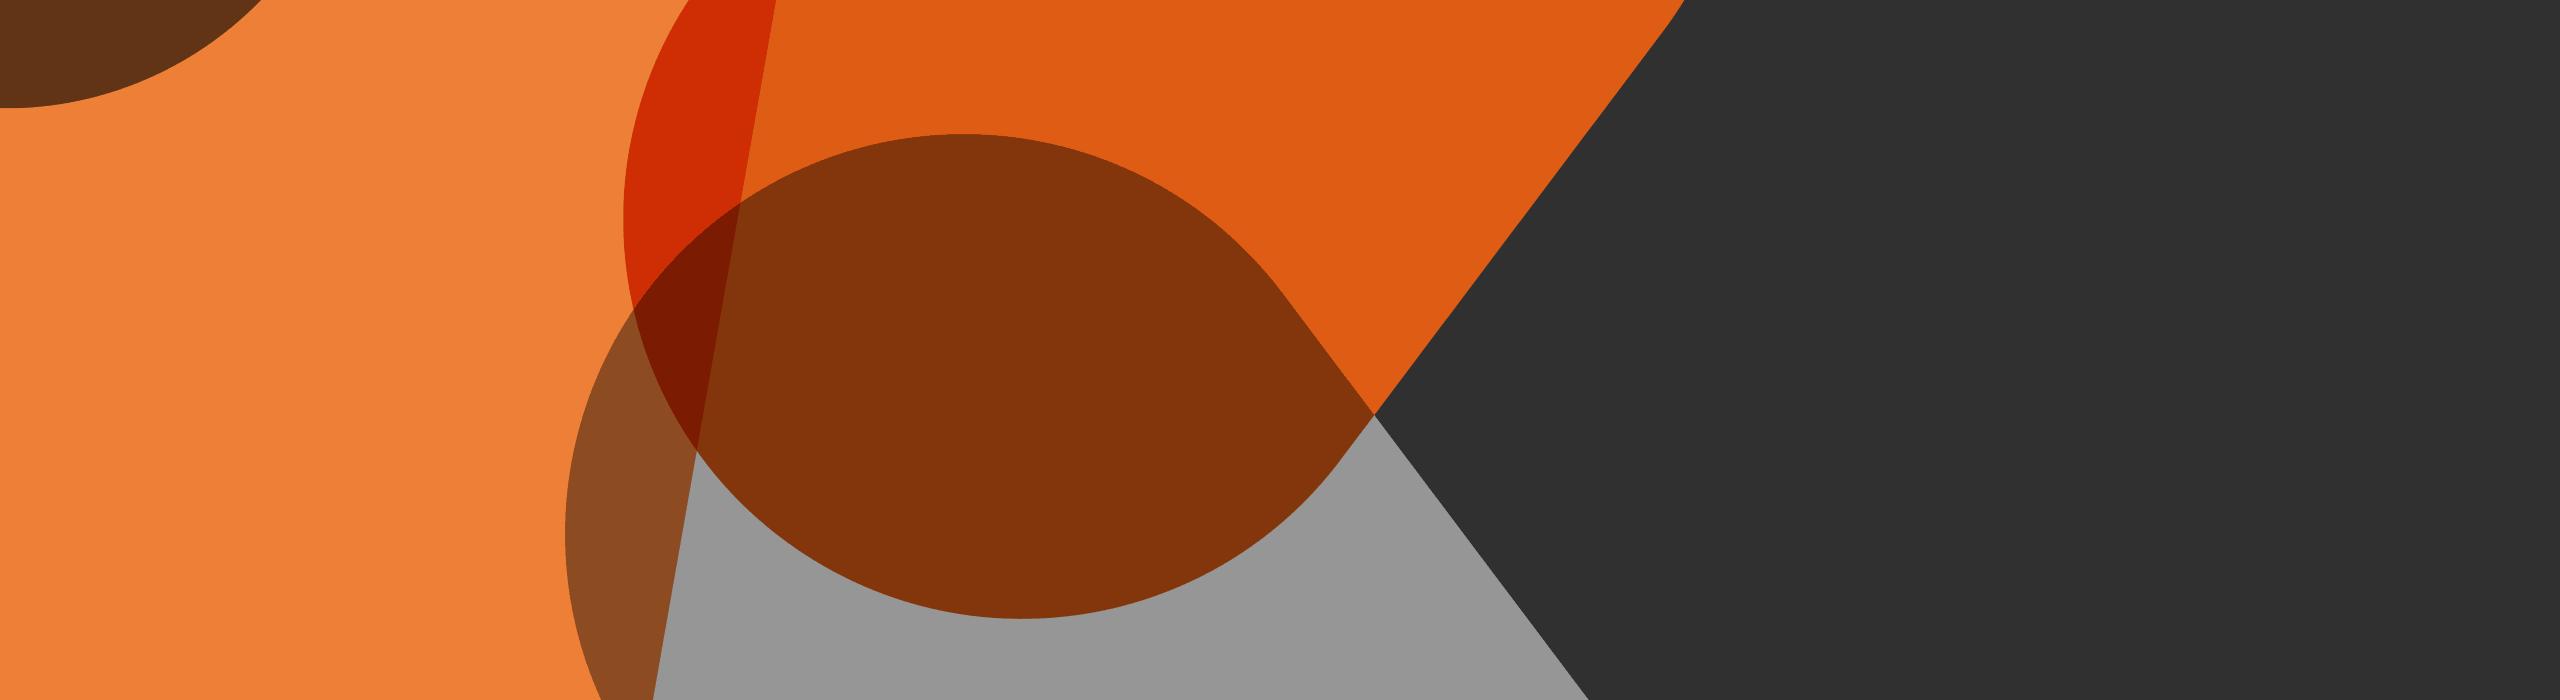 Kahena - natie-kahena-abstract-background - Natie Branding Agency